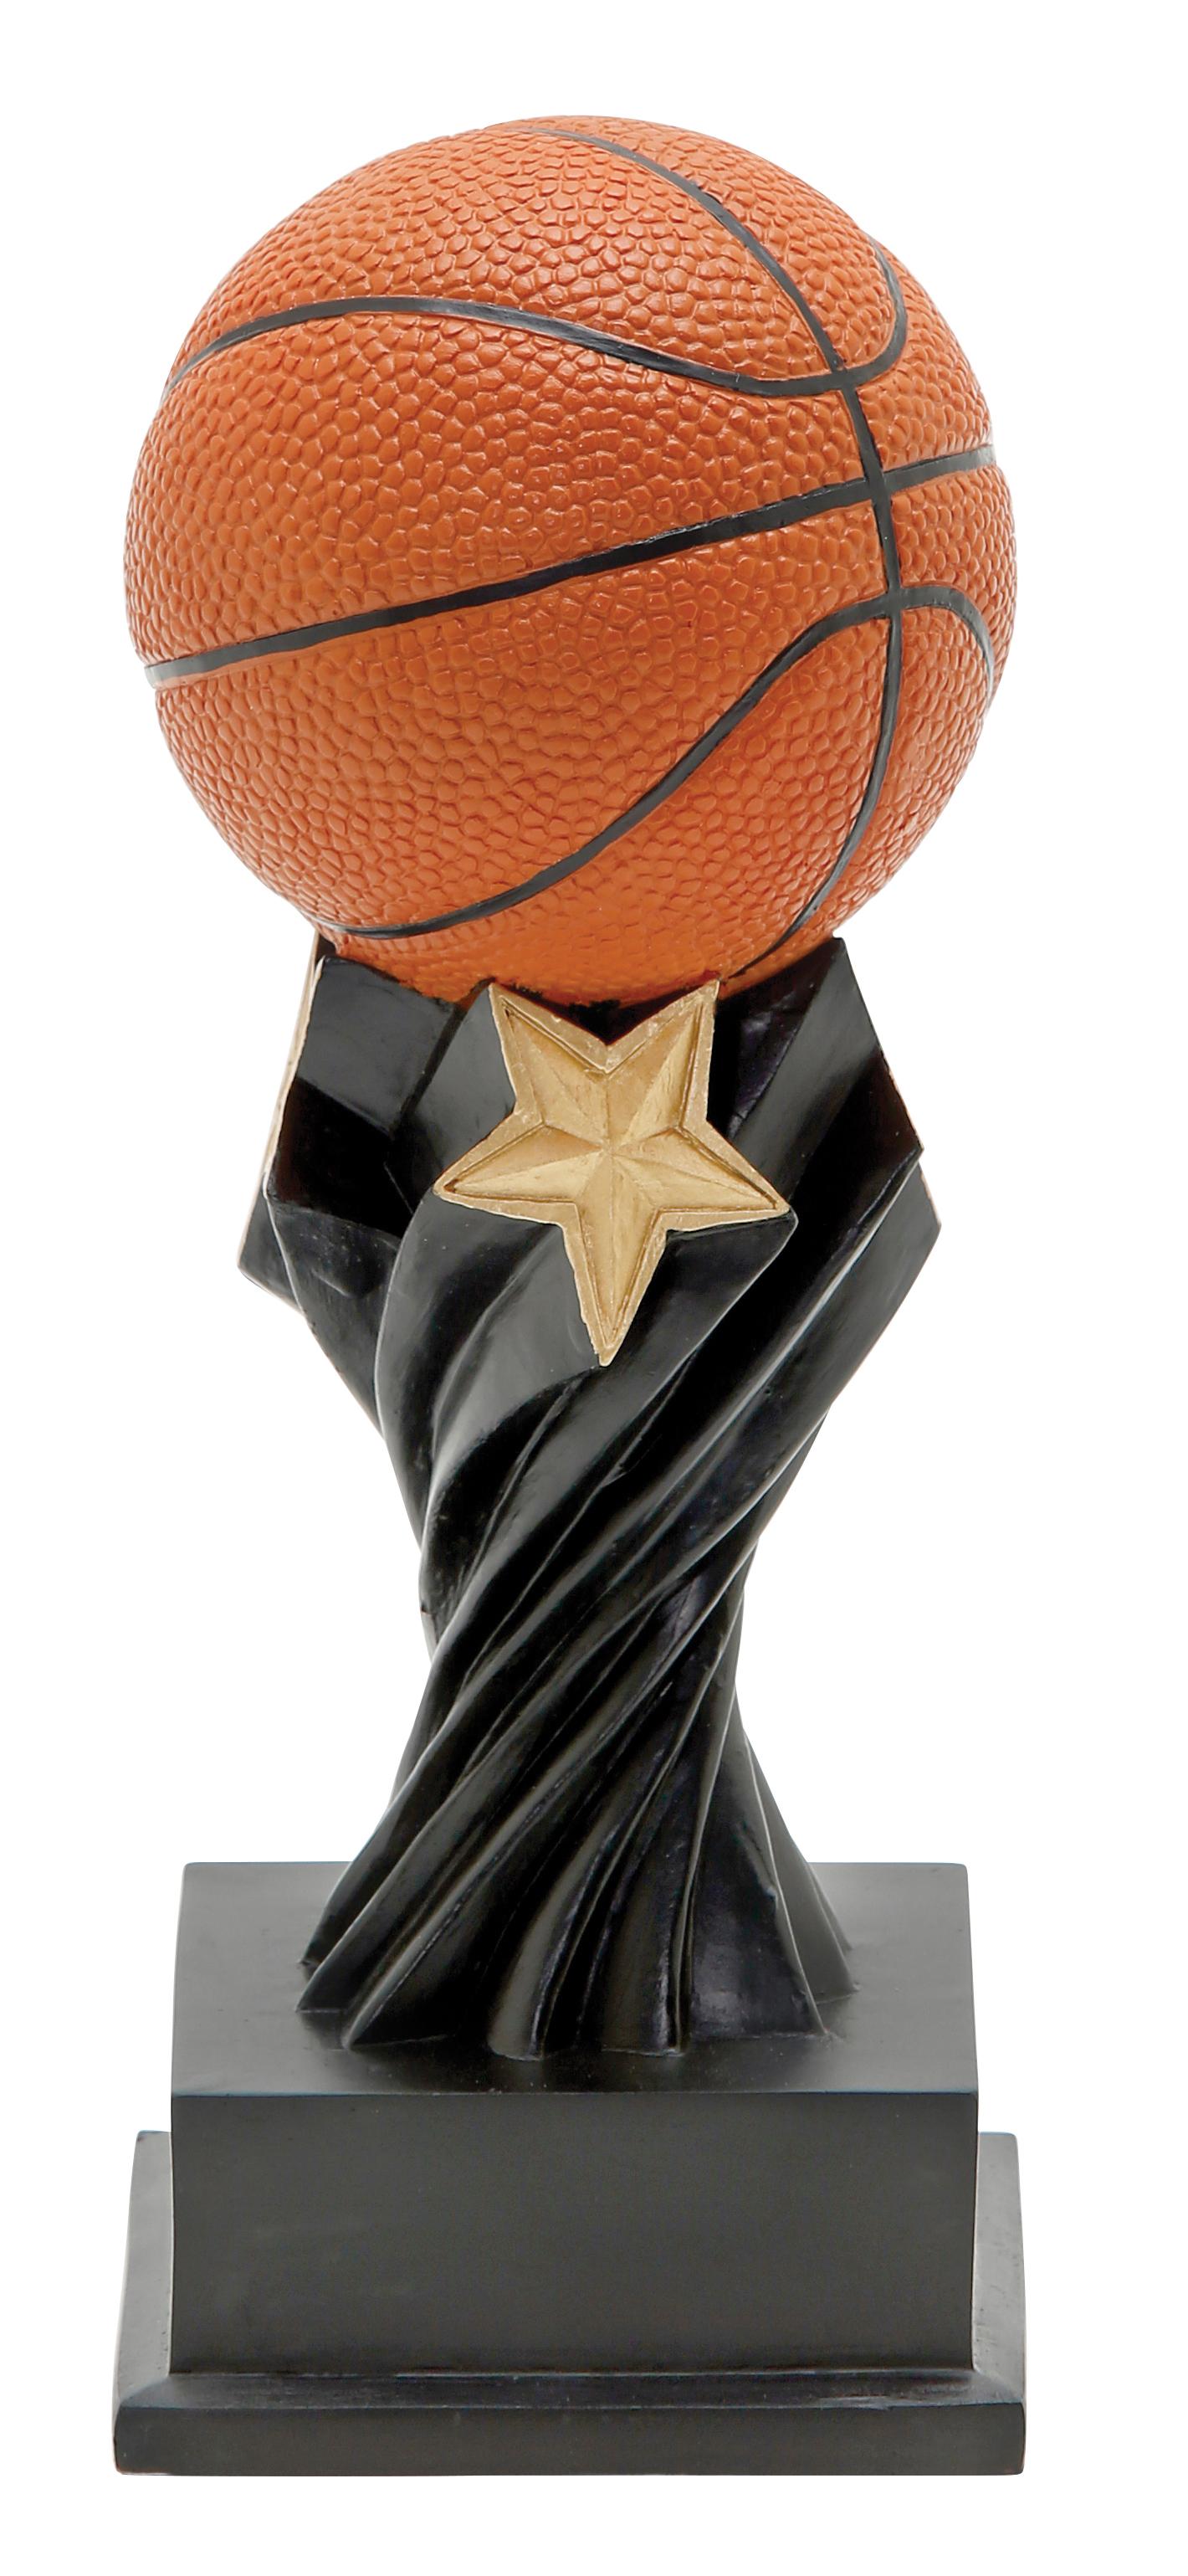 Basketball   Large - 91305GS  Medium - 91305GS  Small - 91205GS